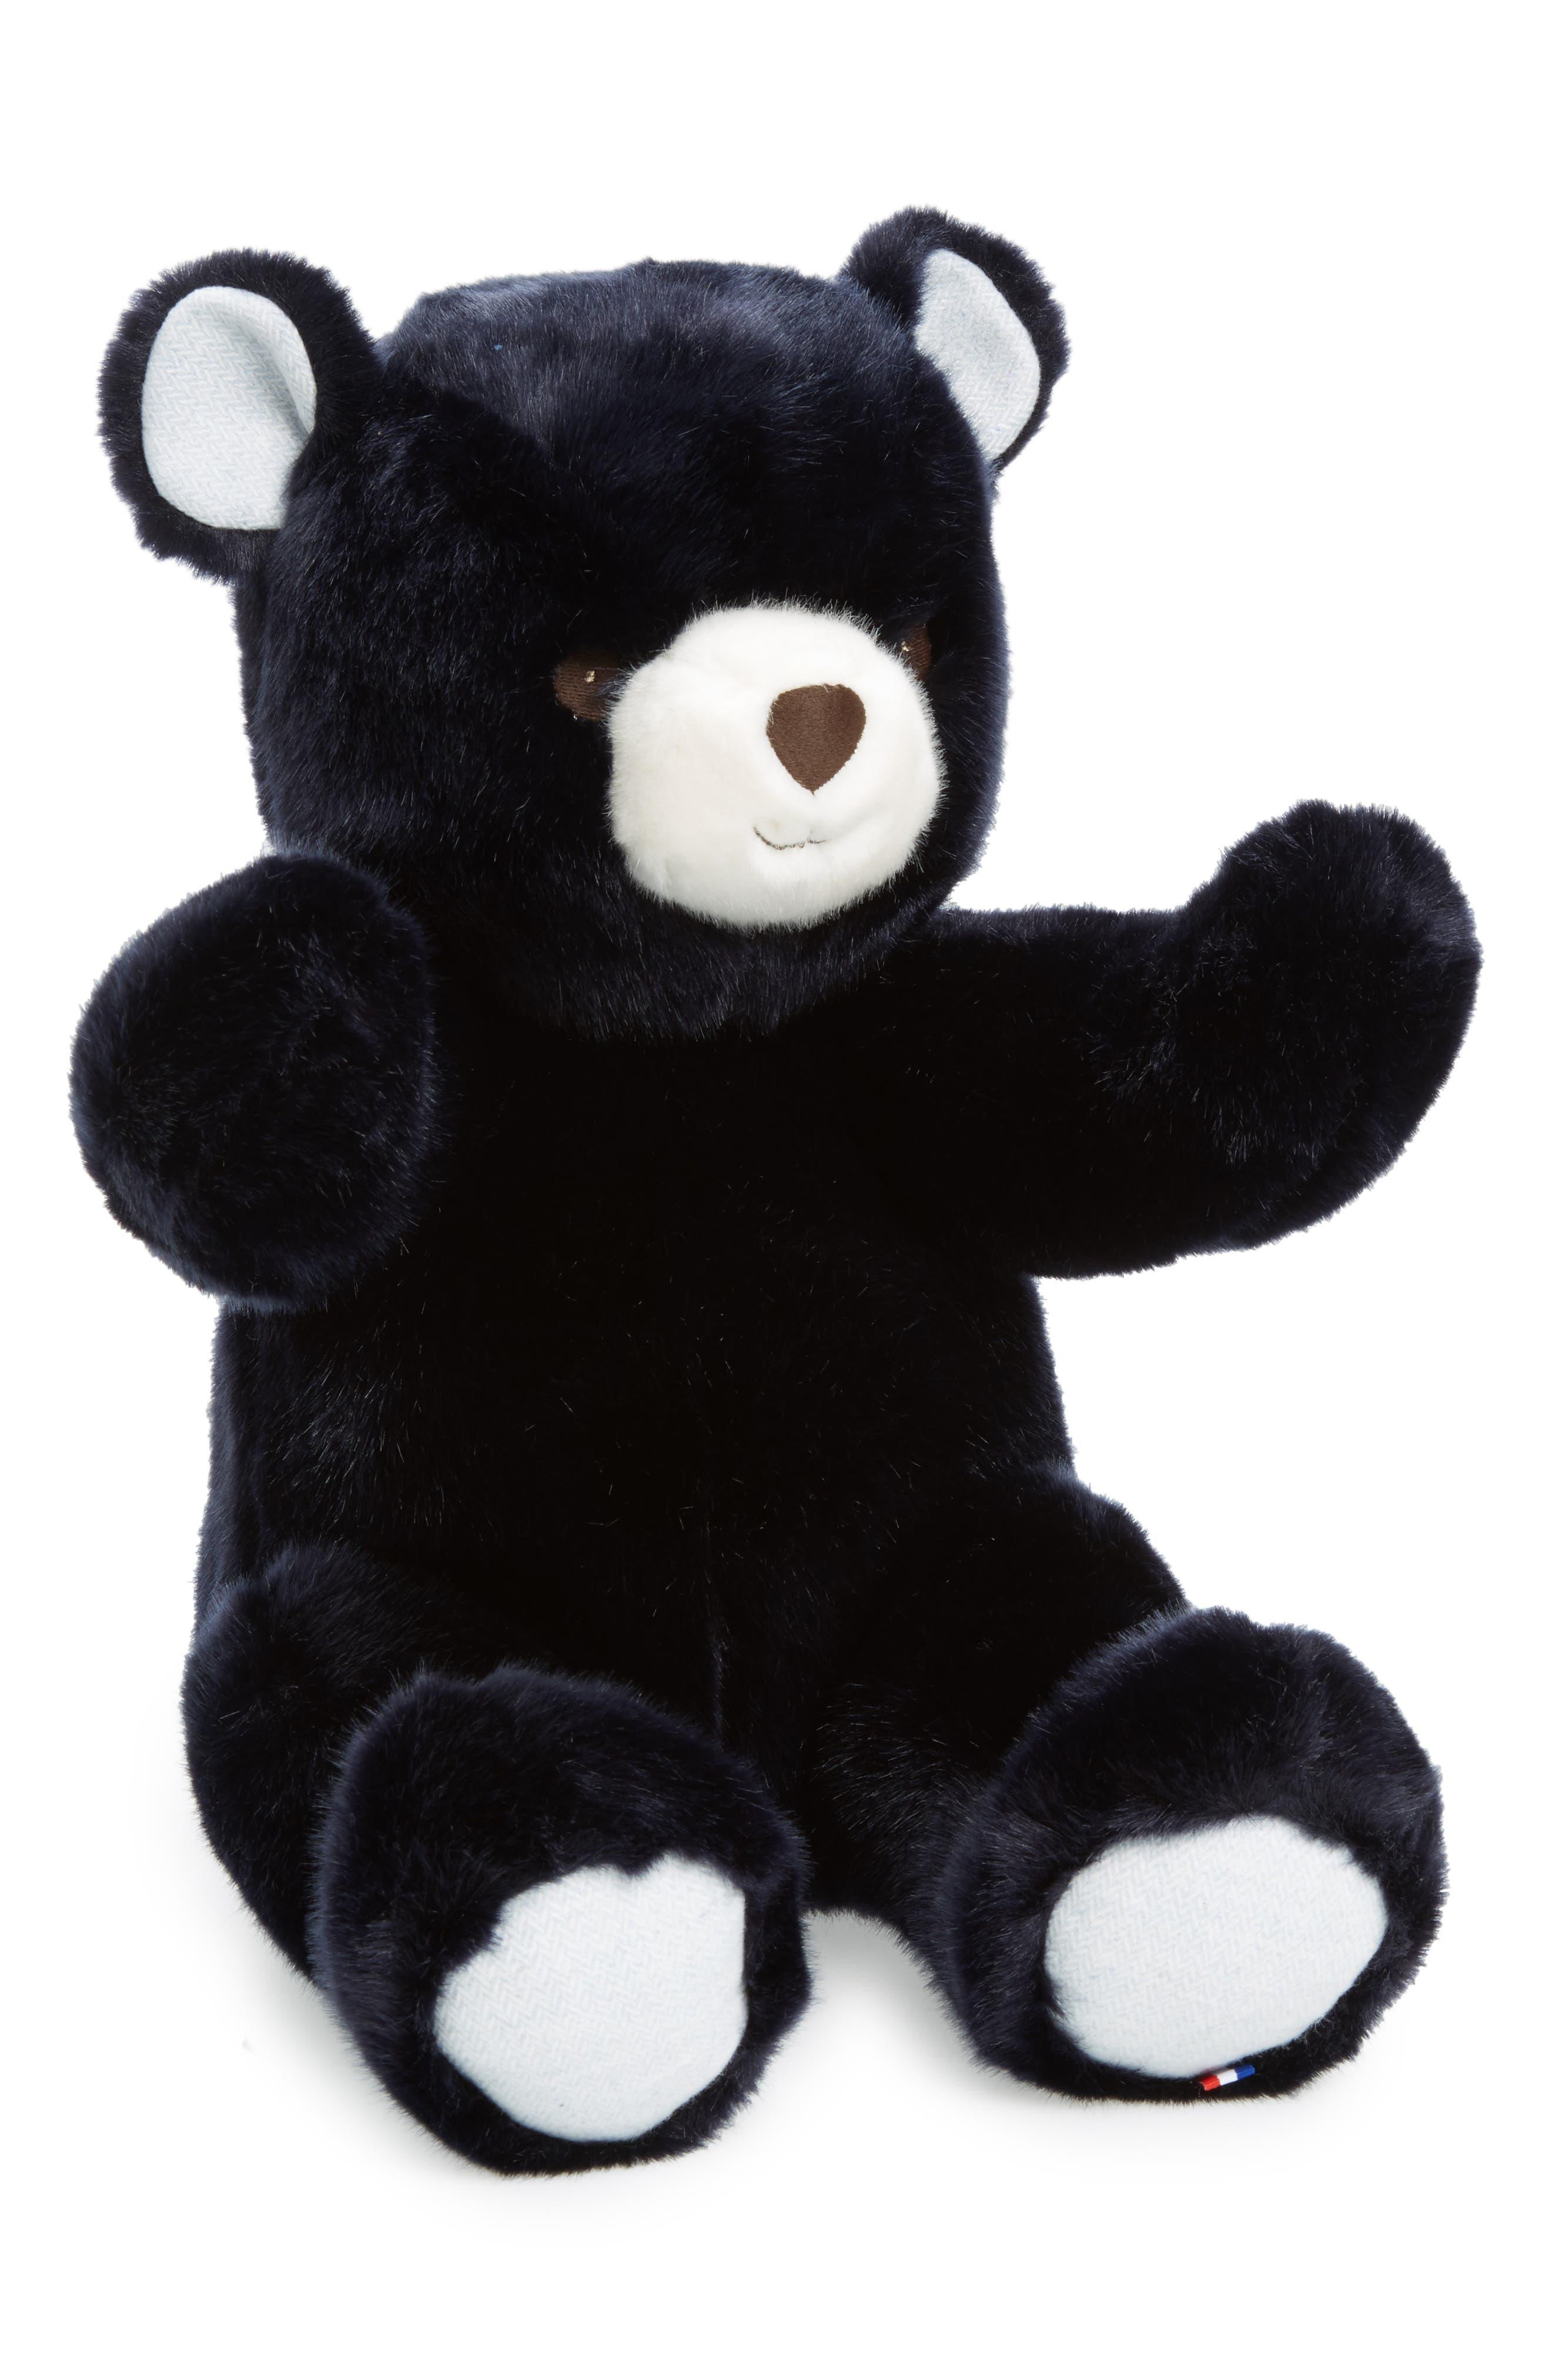 Main Image - Pamplemousse Peluches Robert the Bear Stuffed Animal